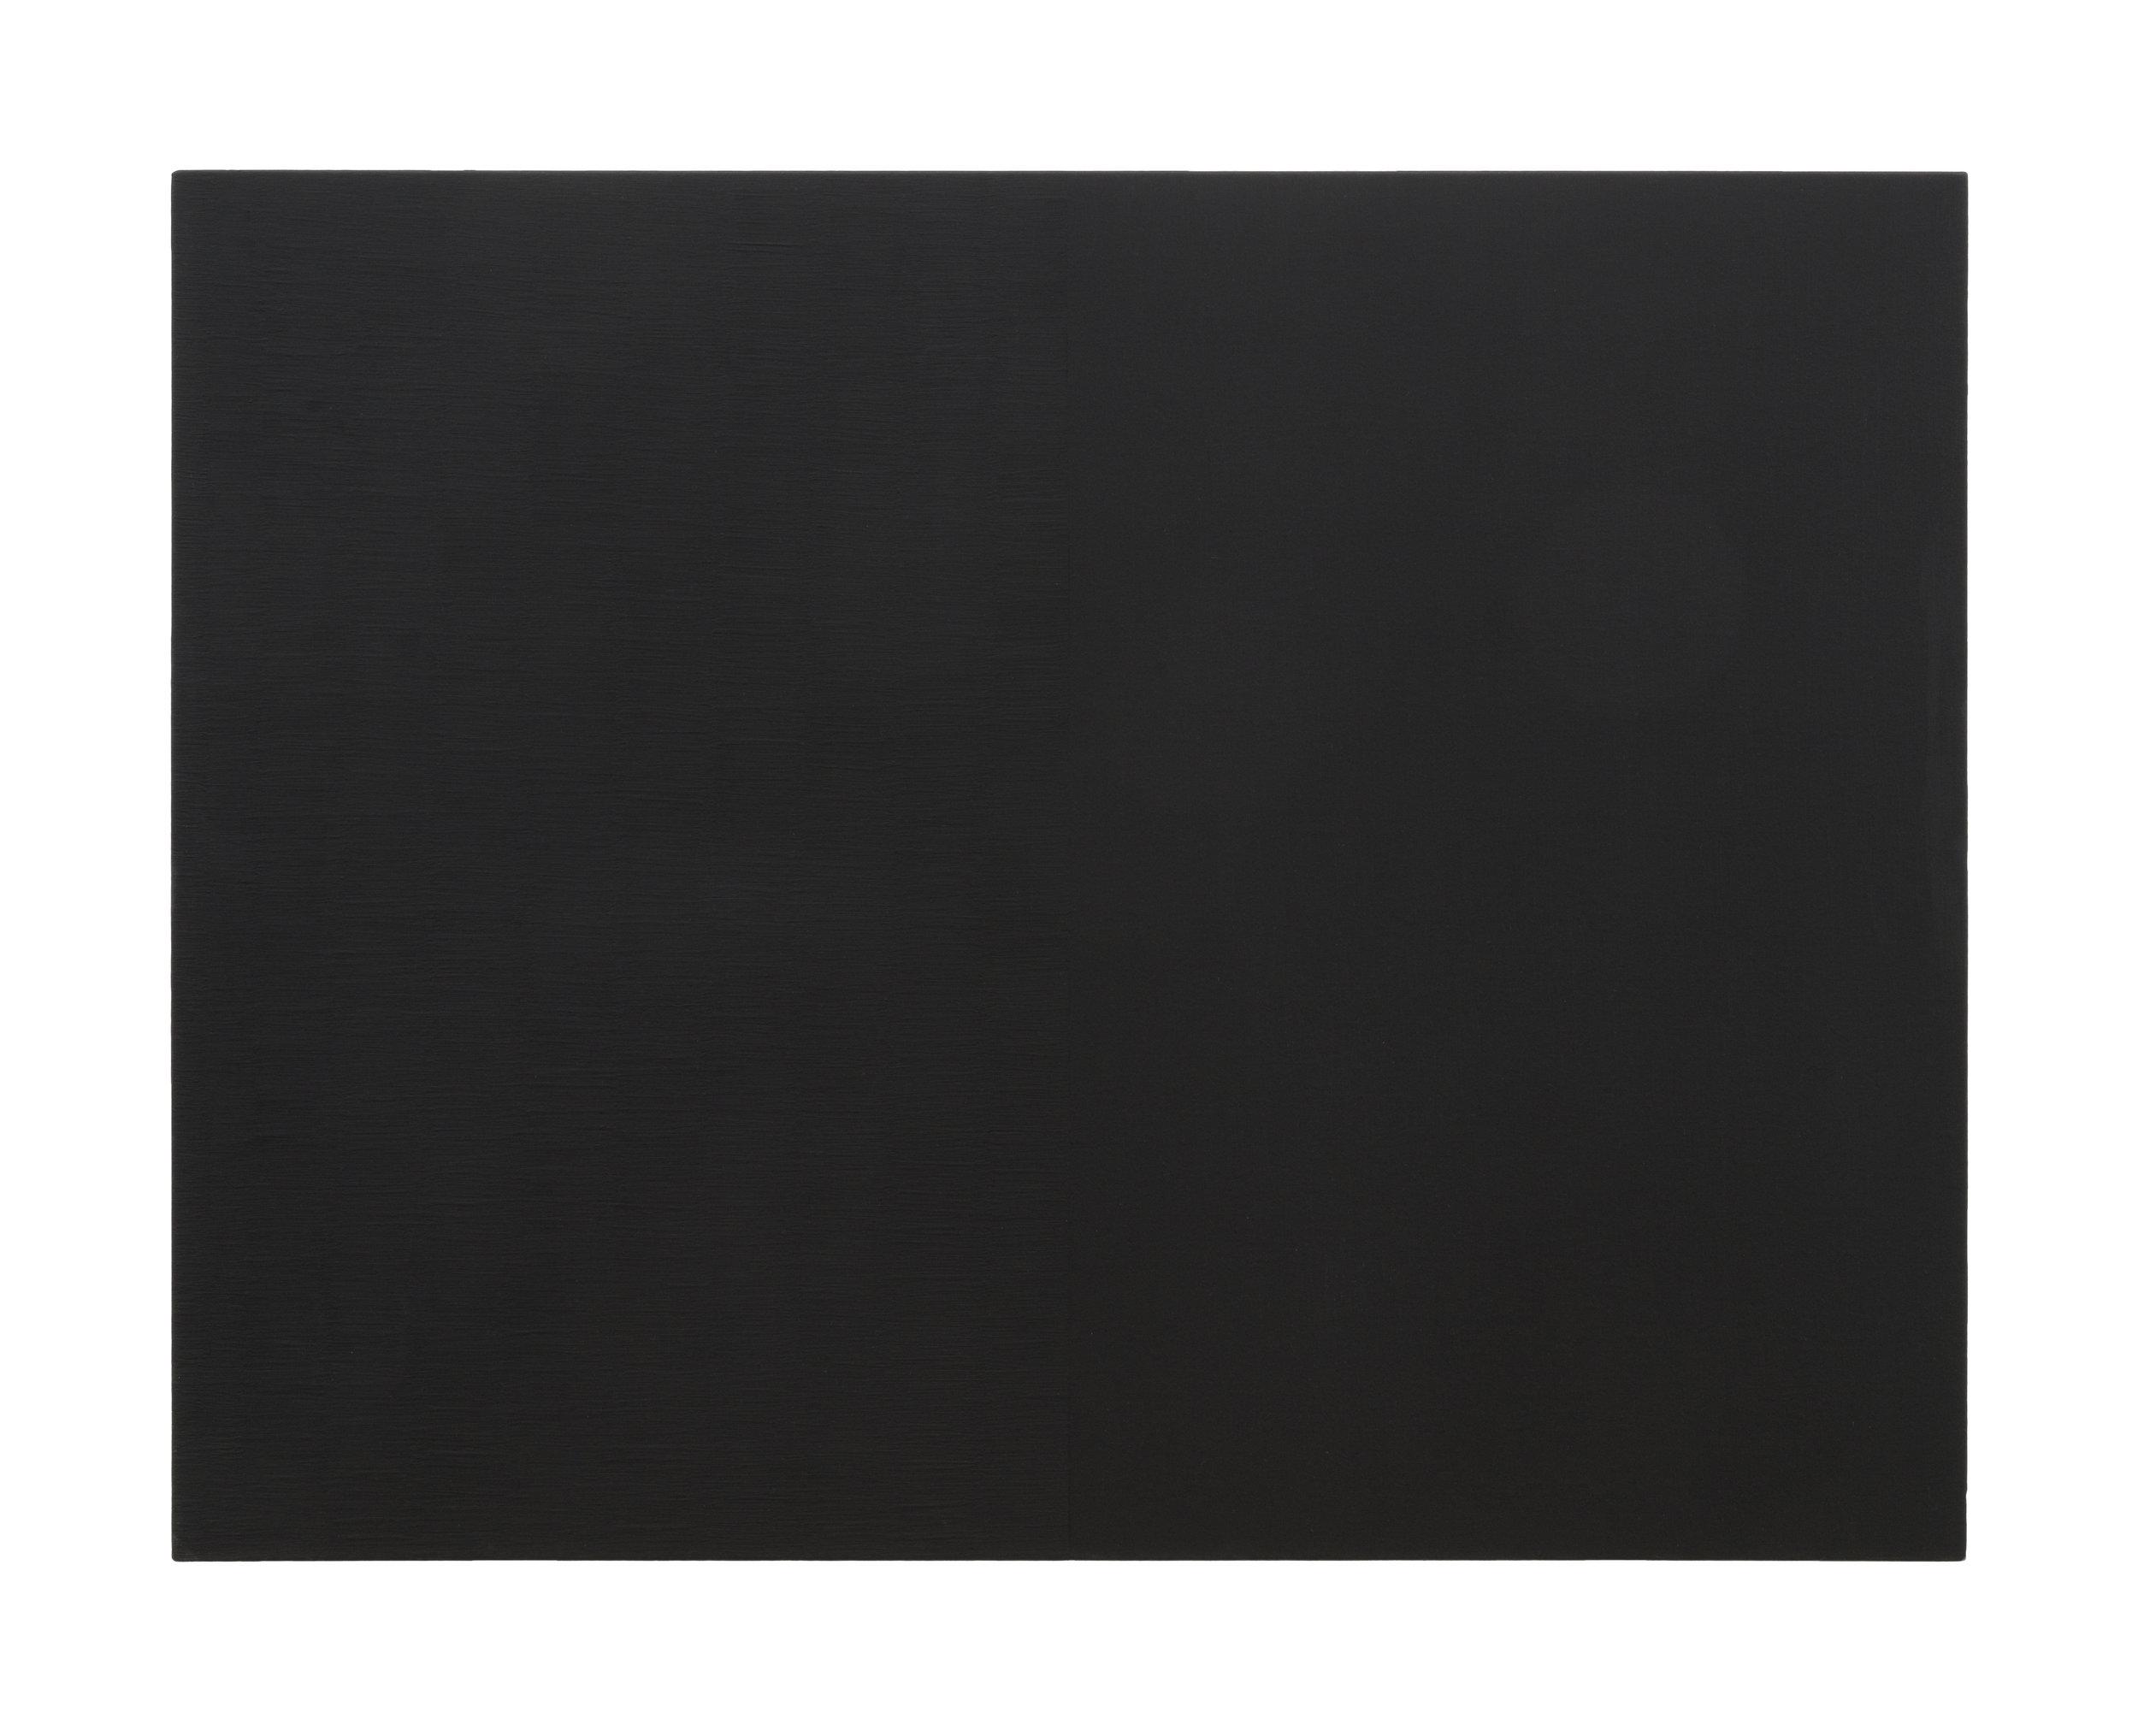 Edith Baumann  Untitled #4,  1979 acrylic on canvas 36 x 46 - 3/4 inches